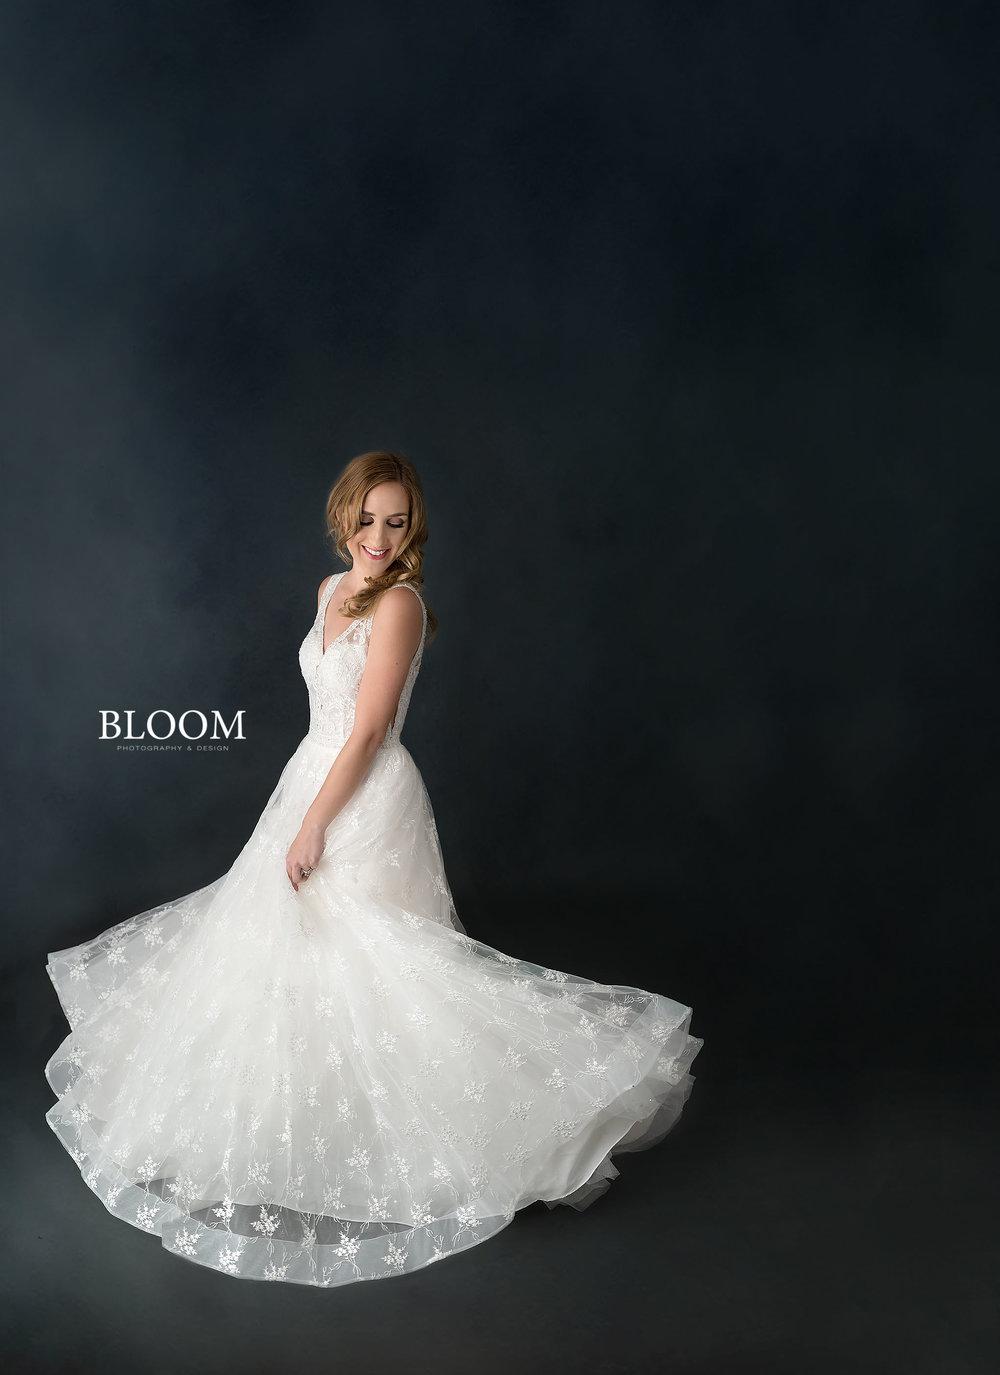 wedding_bridal_san_antonio_photographer_texas_bloom_033017_3886.jpg